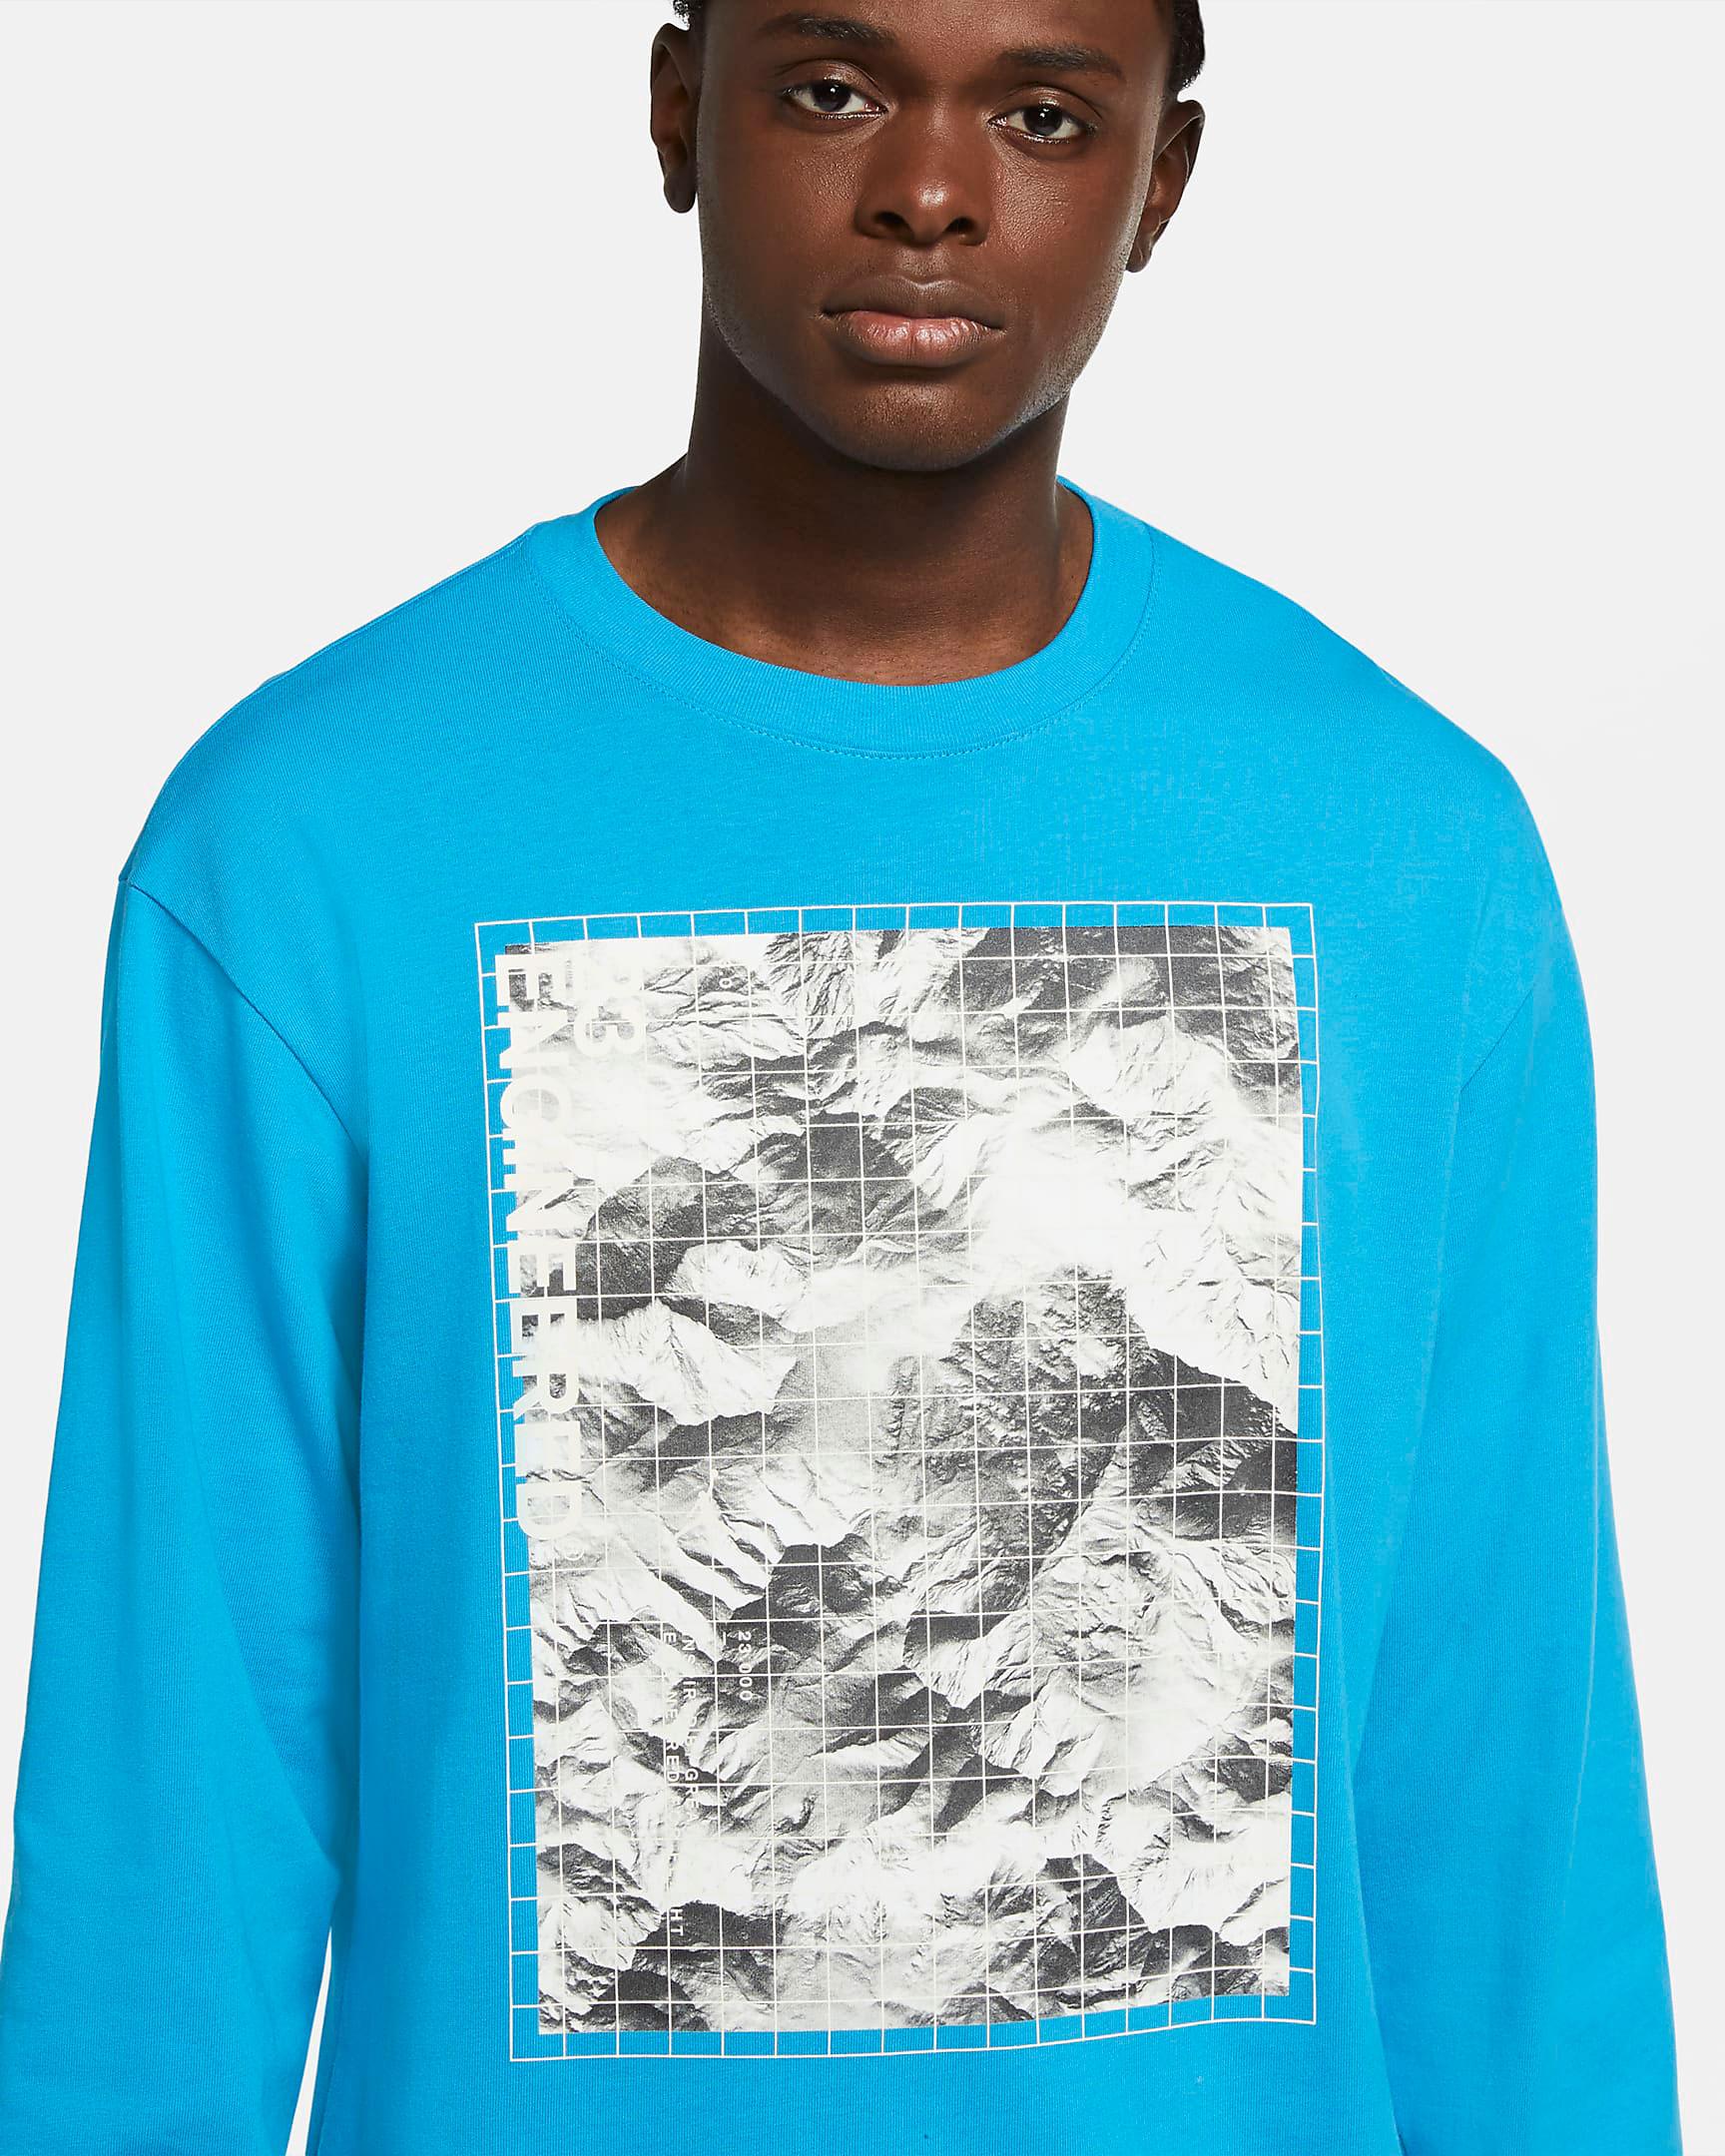 air-jordan-1-low-laser-blue-shirt-2